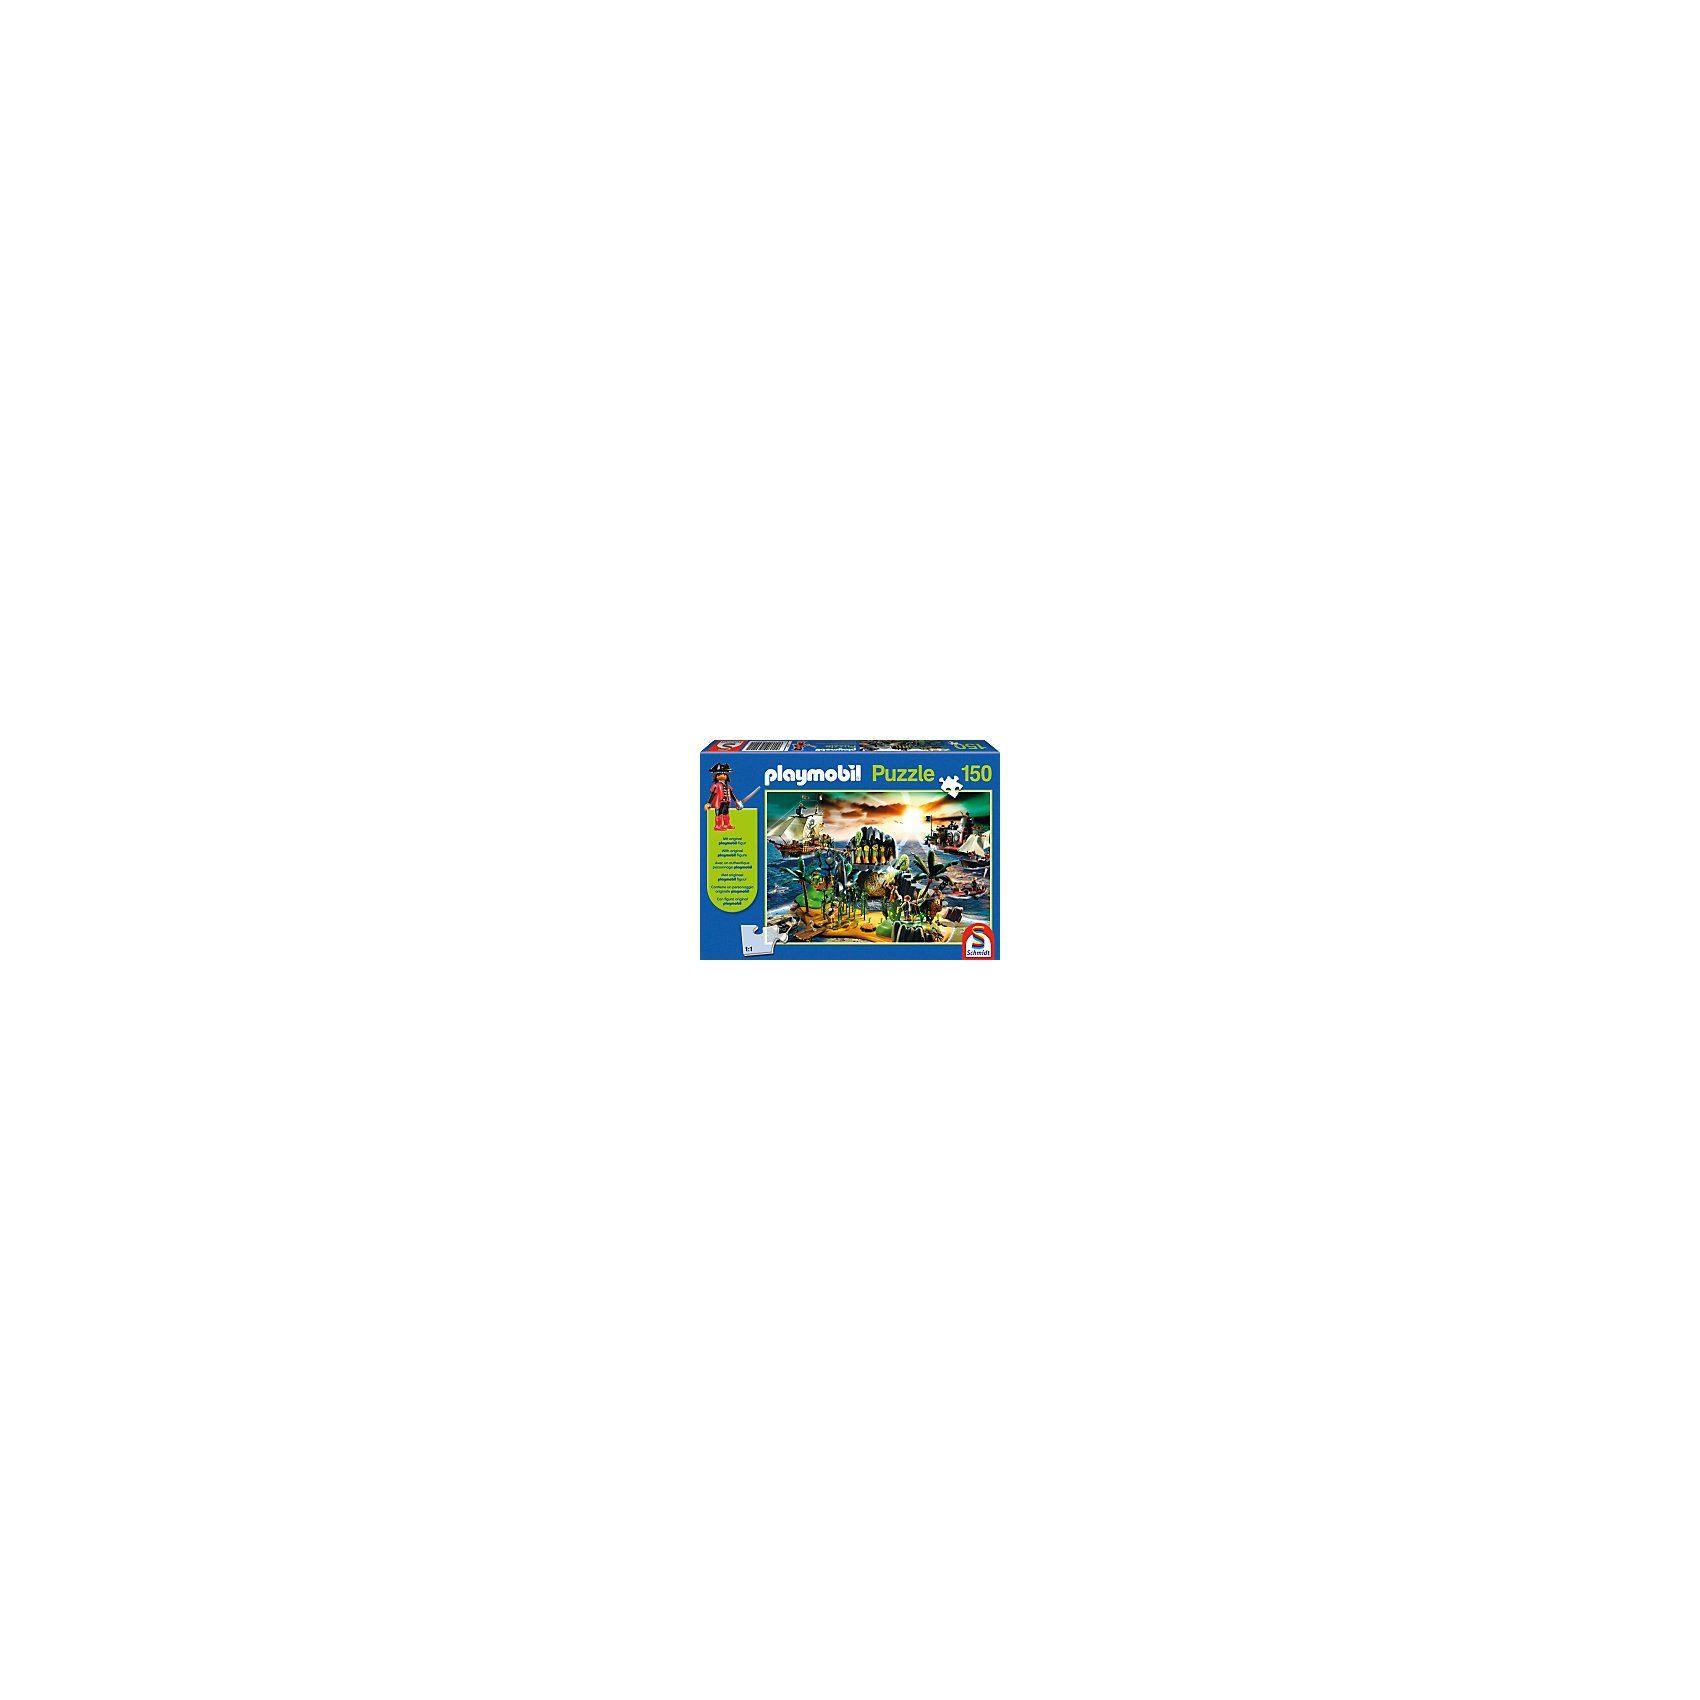 Schmidt Spiele Playmobil, Pirateninsel, 150 Teile